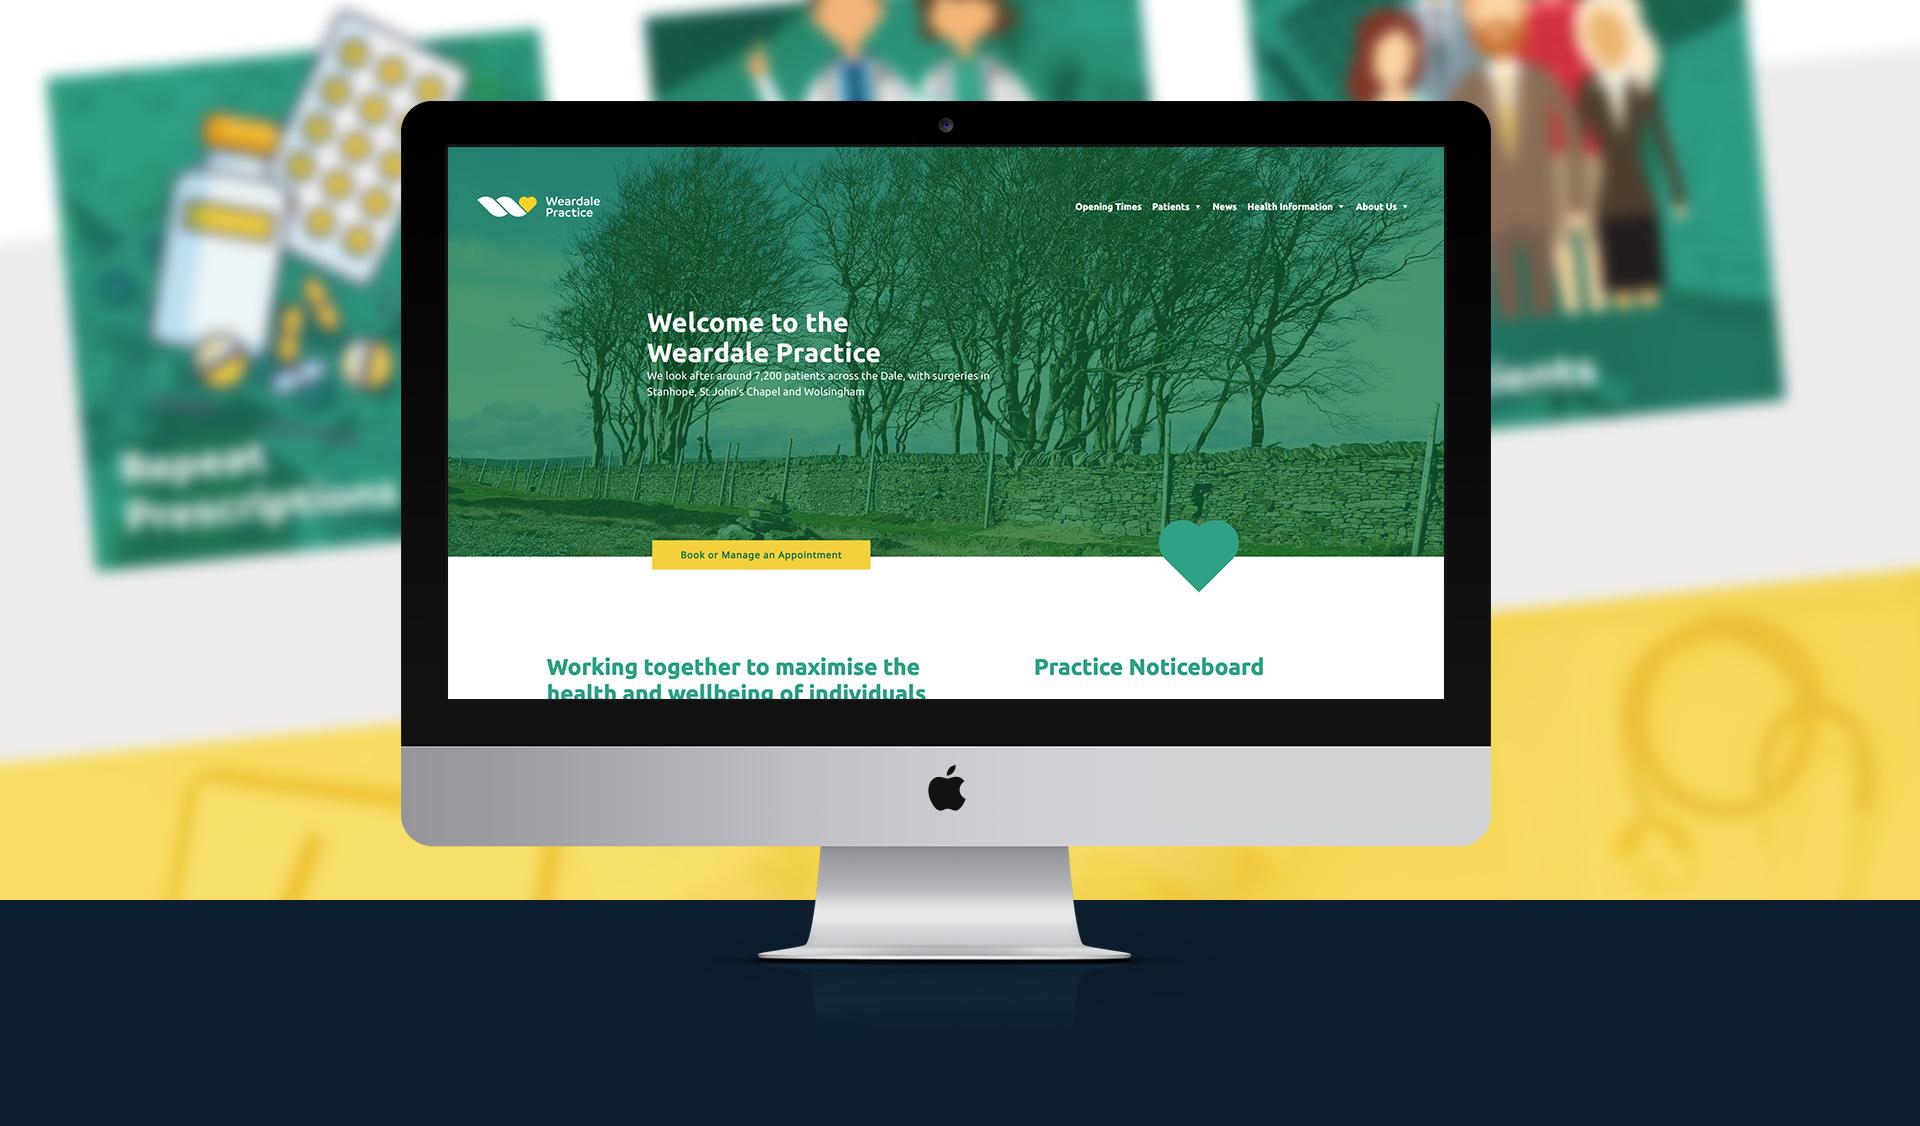 weardale-practice-imac-website-case-study